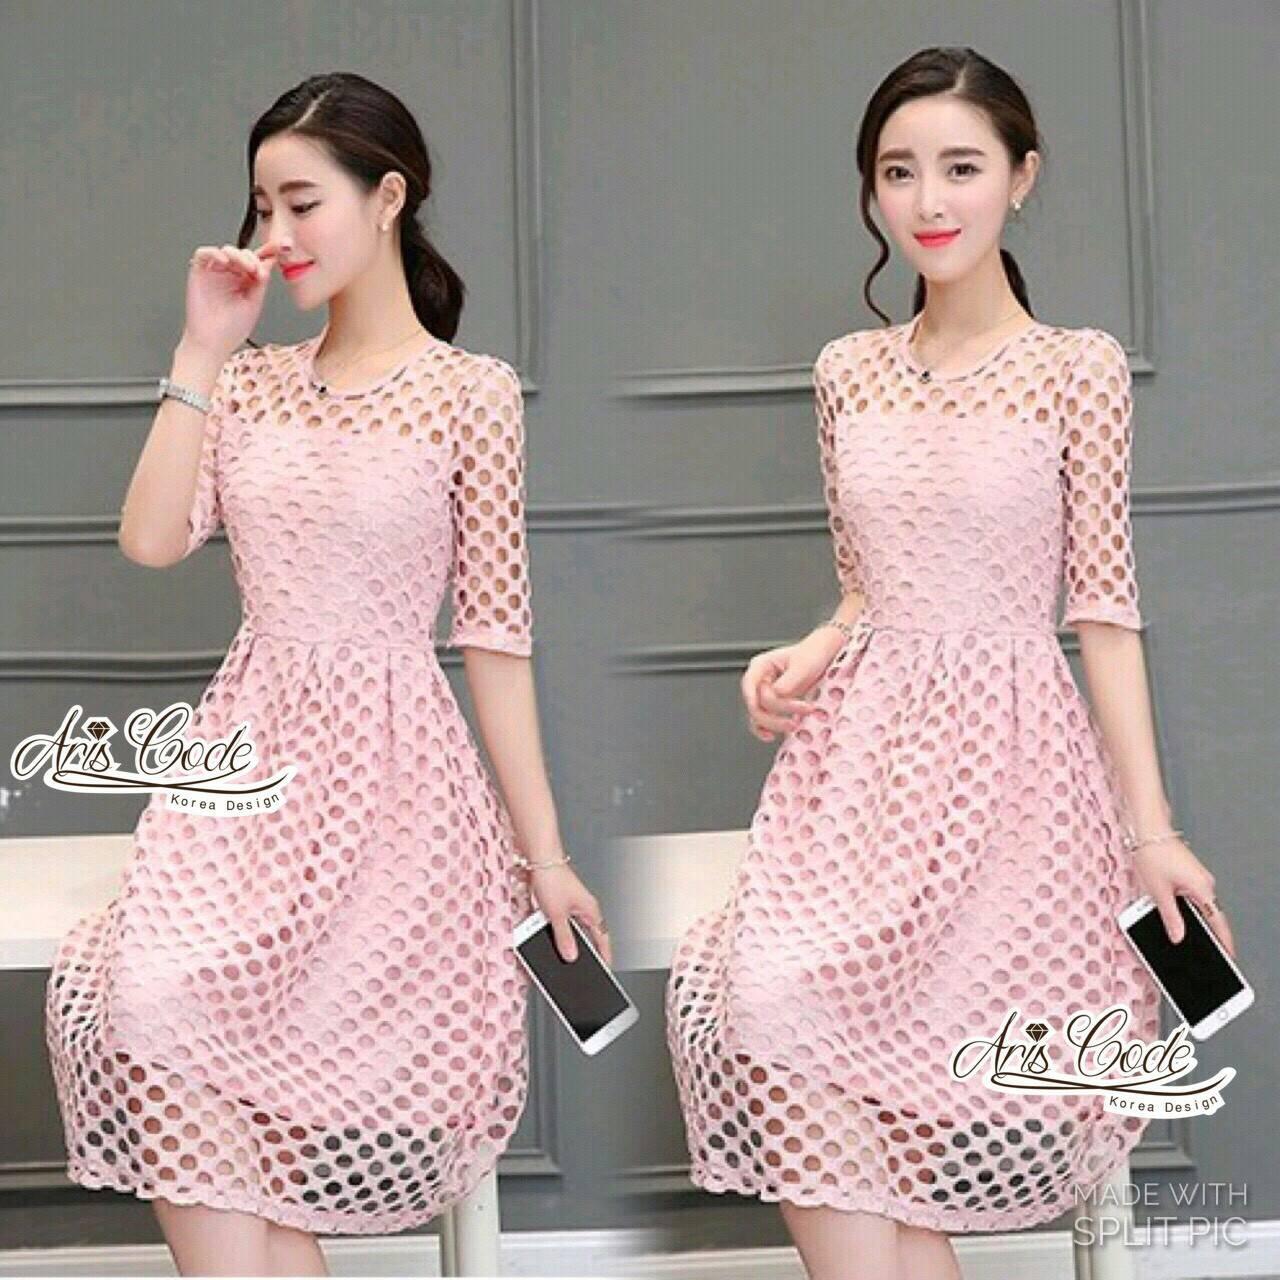 Pink lace dress skirt sweet by Aris Code A247-75E01